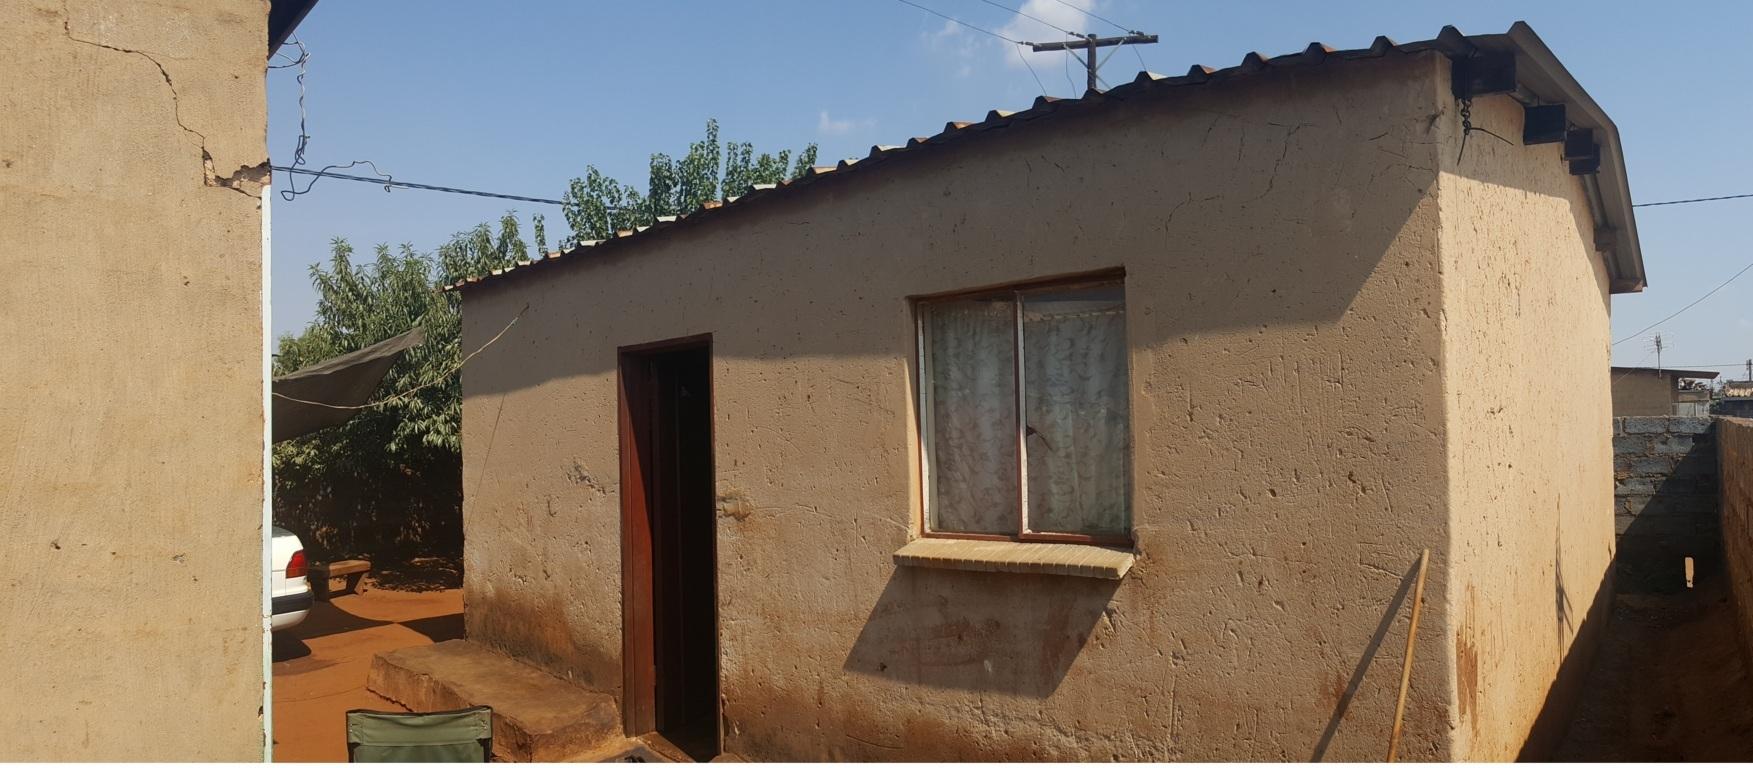 2 BedroomHouse Pending Sale In Tembisa